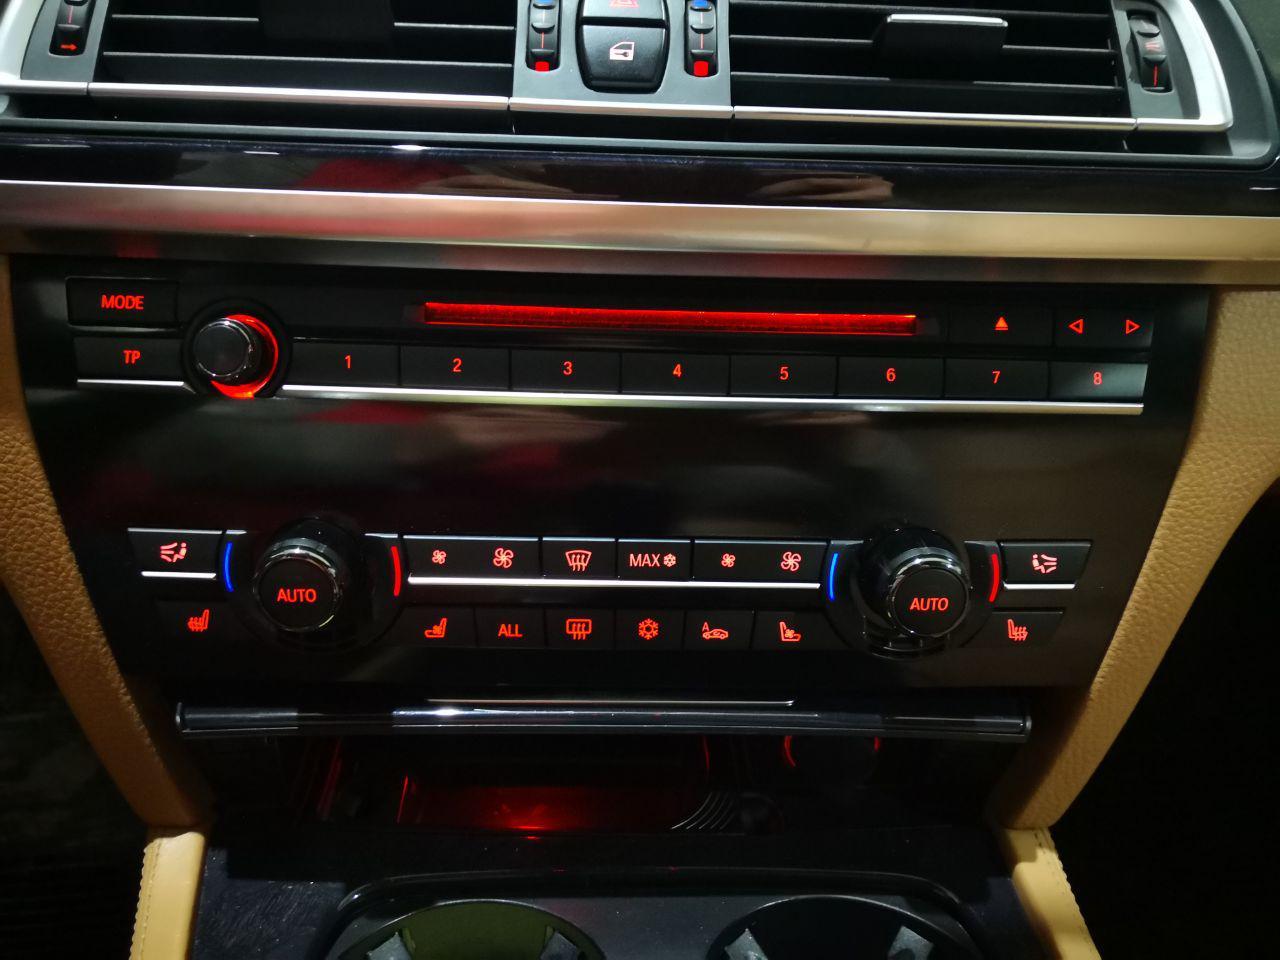 замена кнопок климат контроля bmw f01